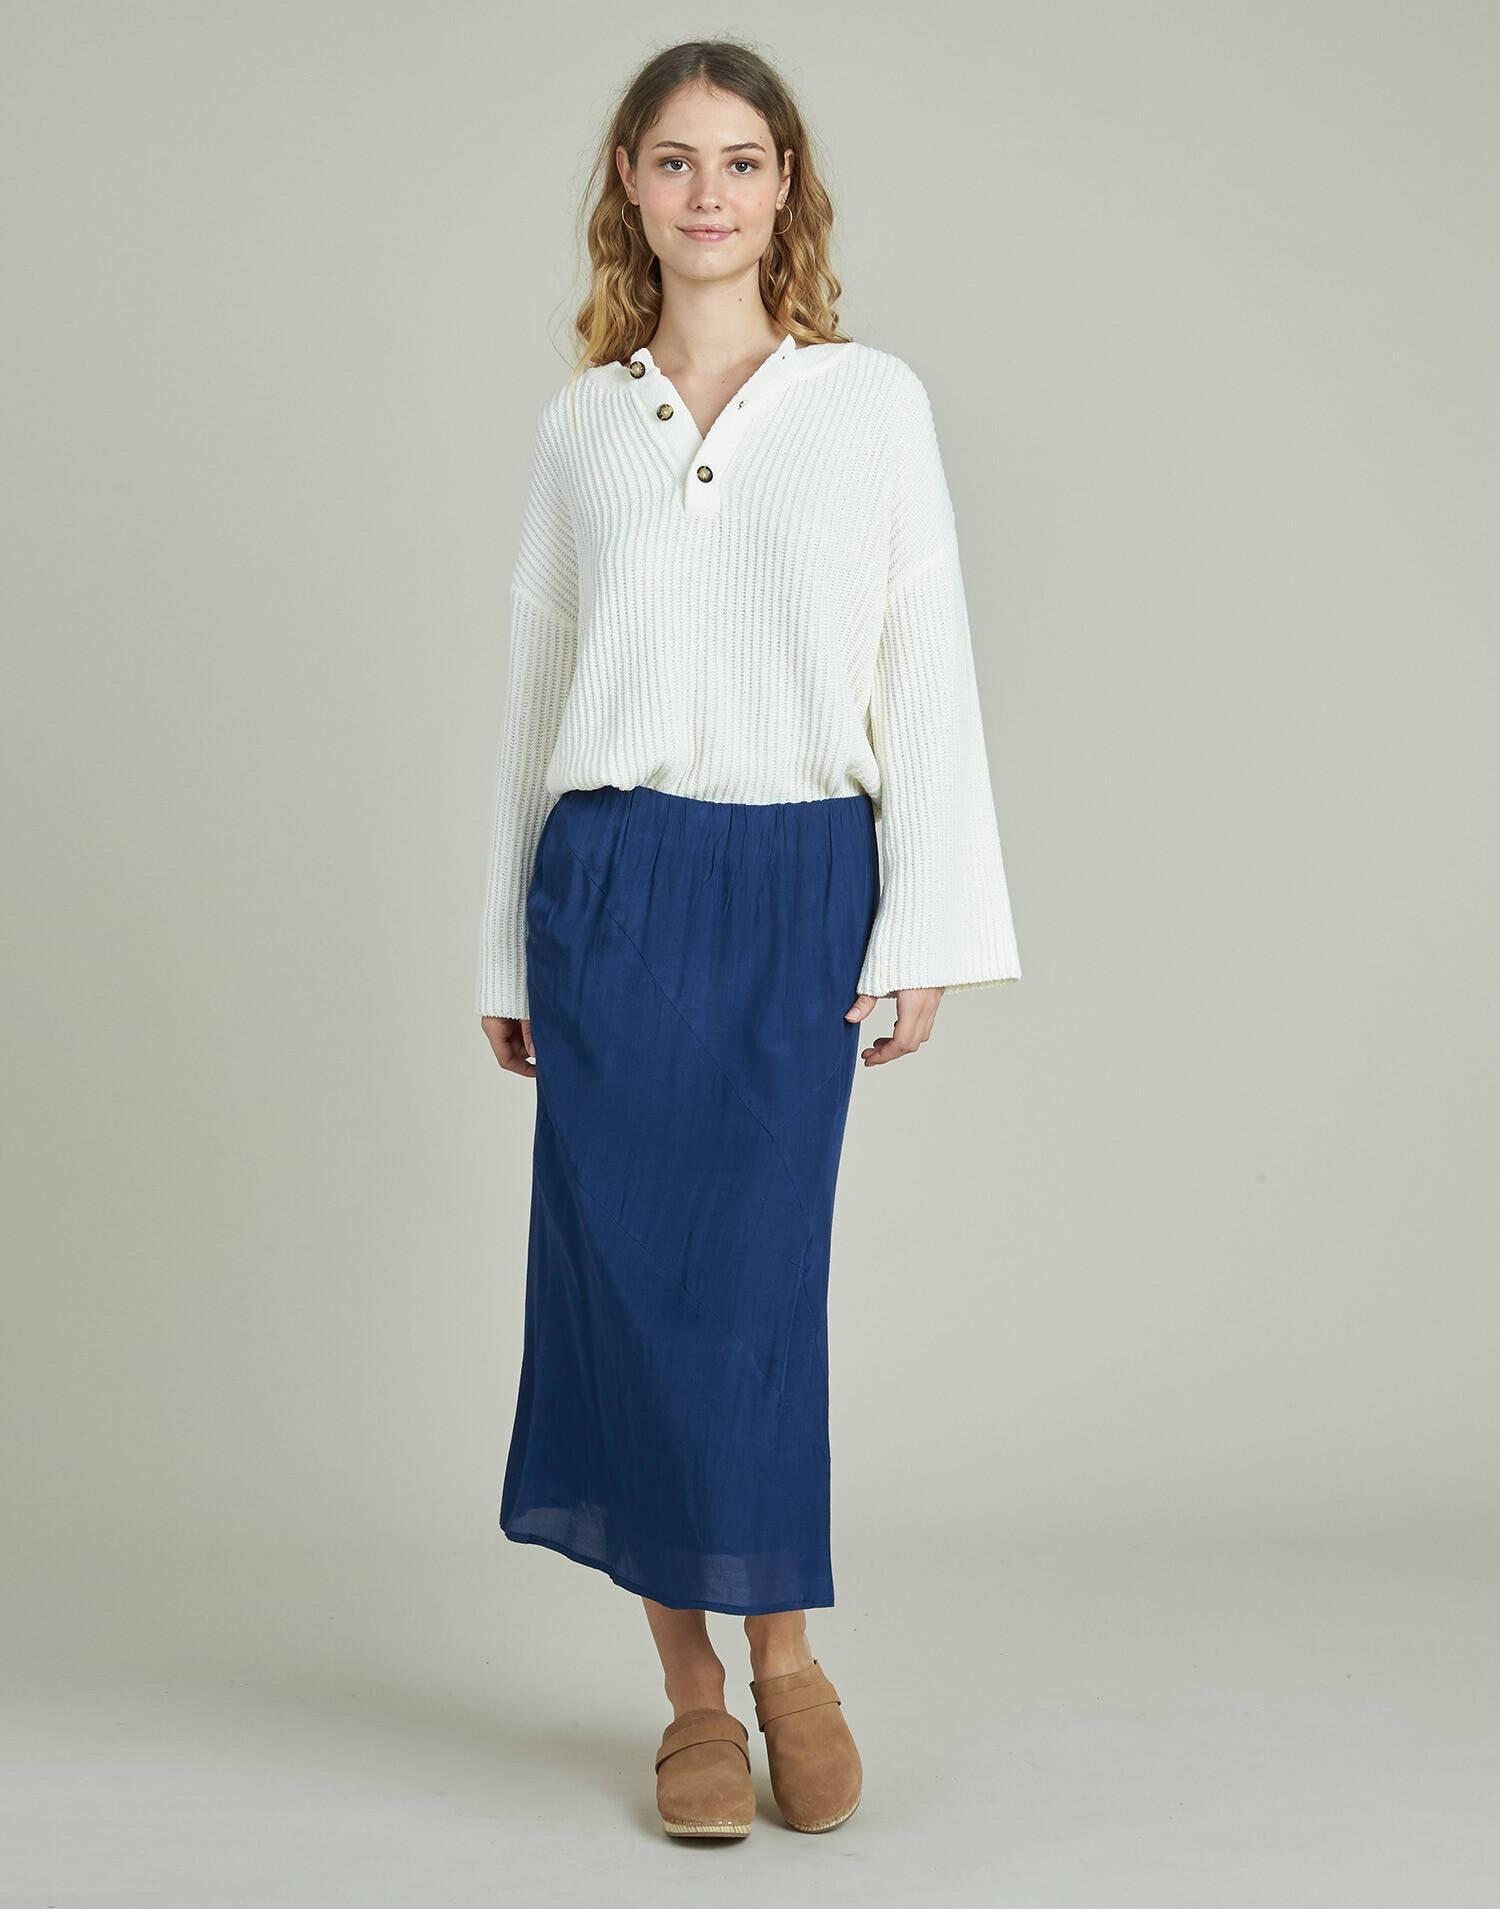 Falda midi costuras oblicuas